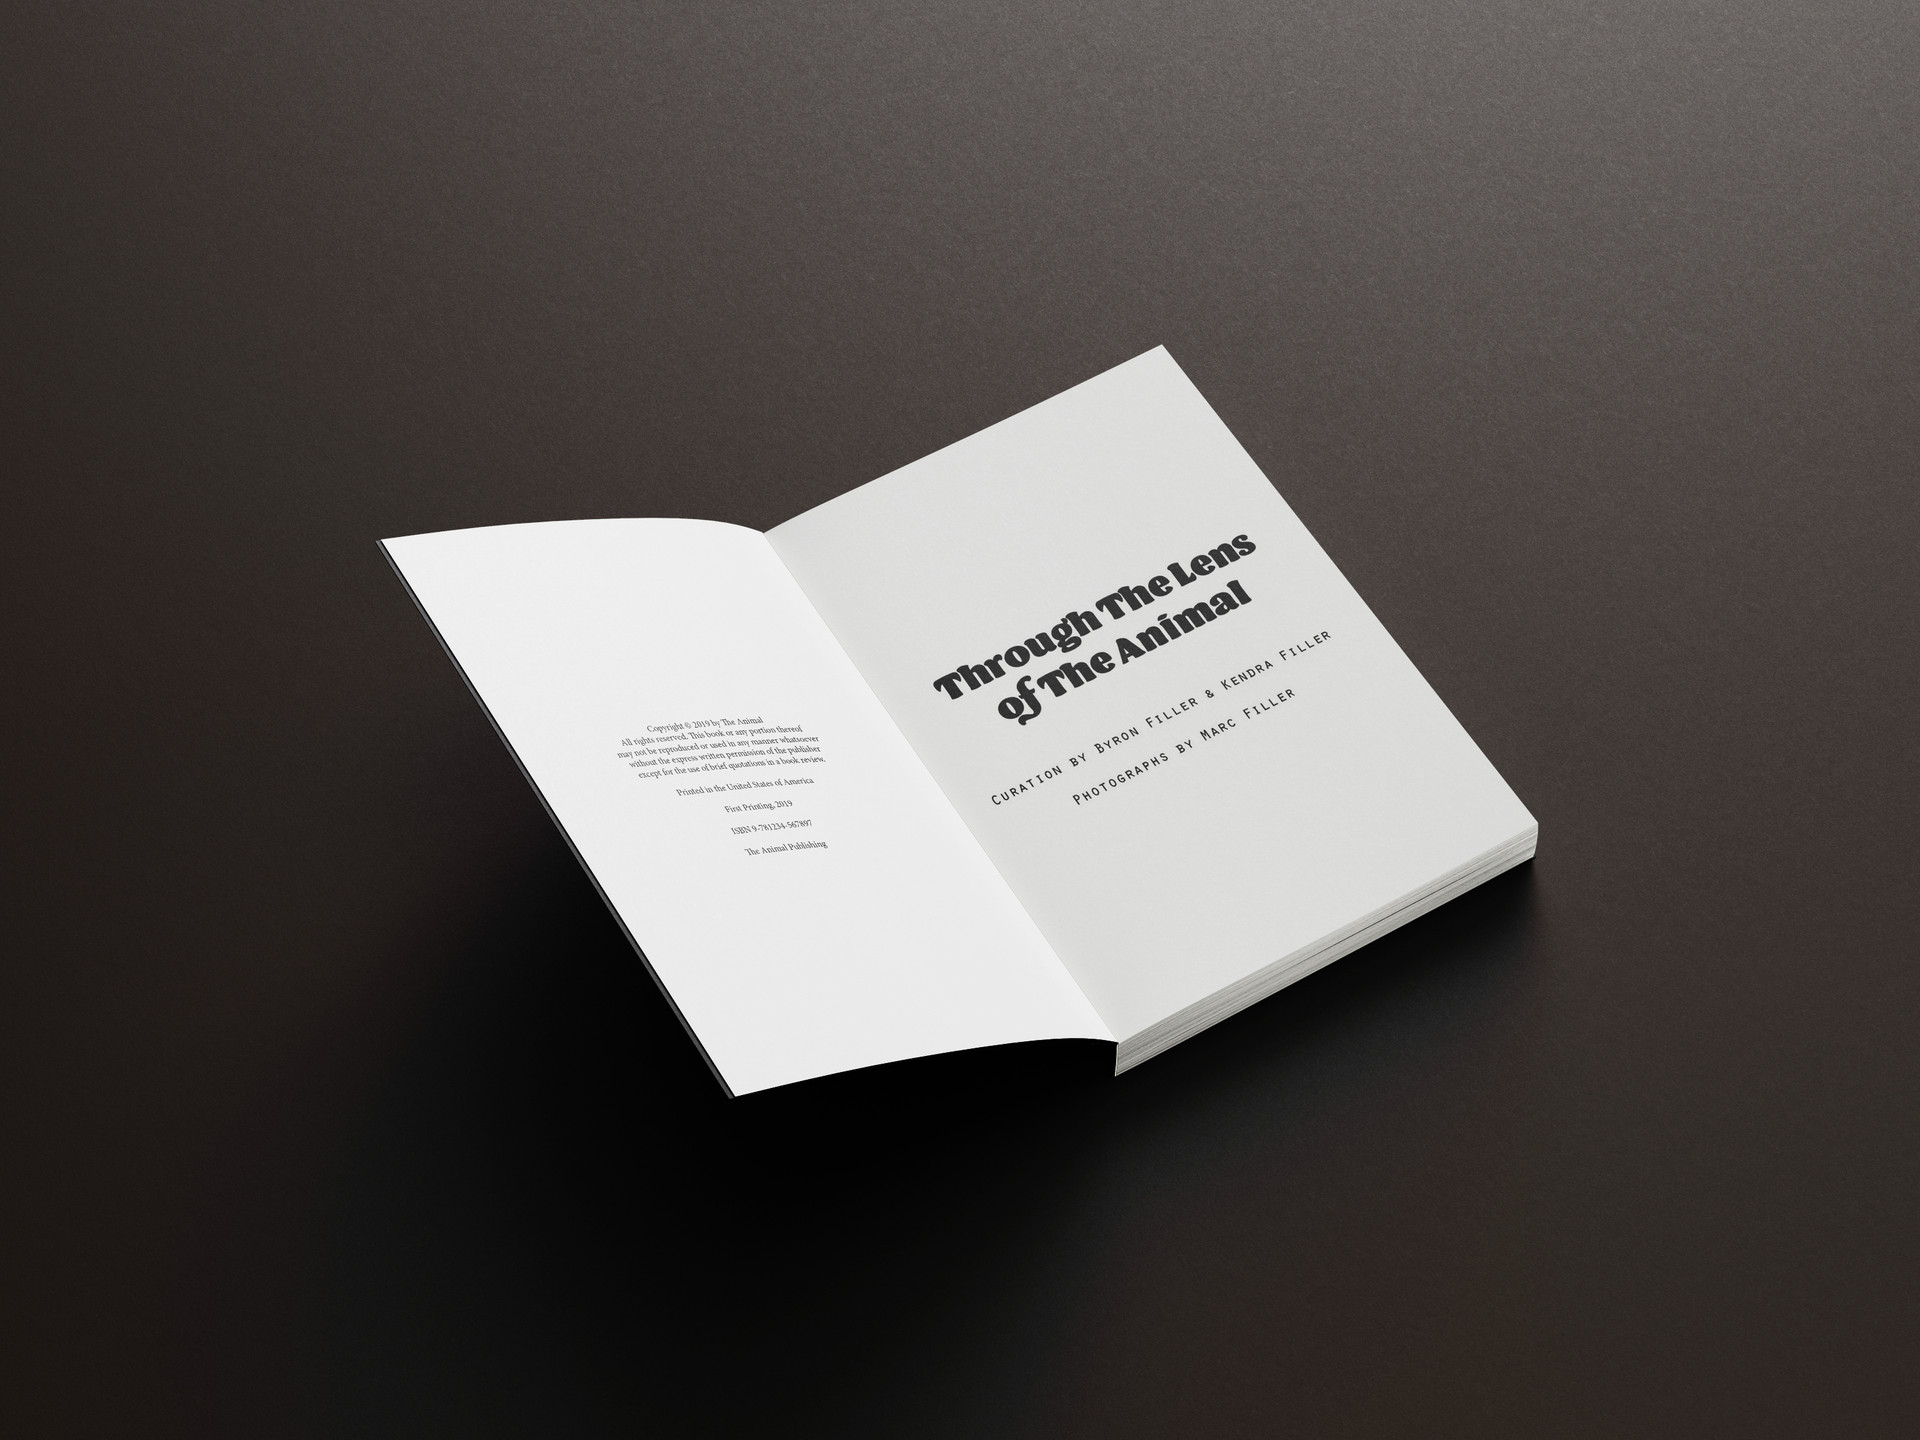 Free_Book_Mockup_3.jpg